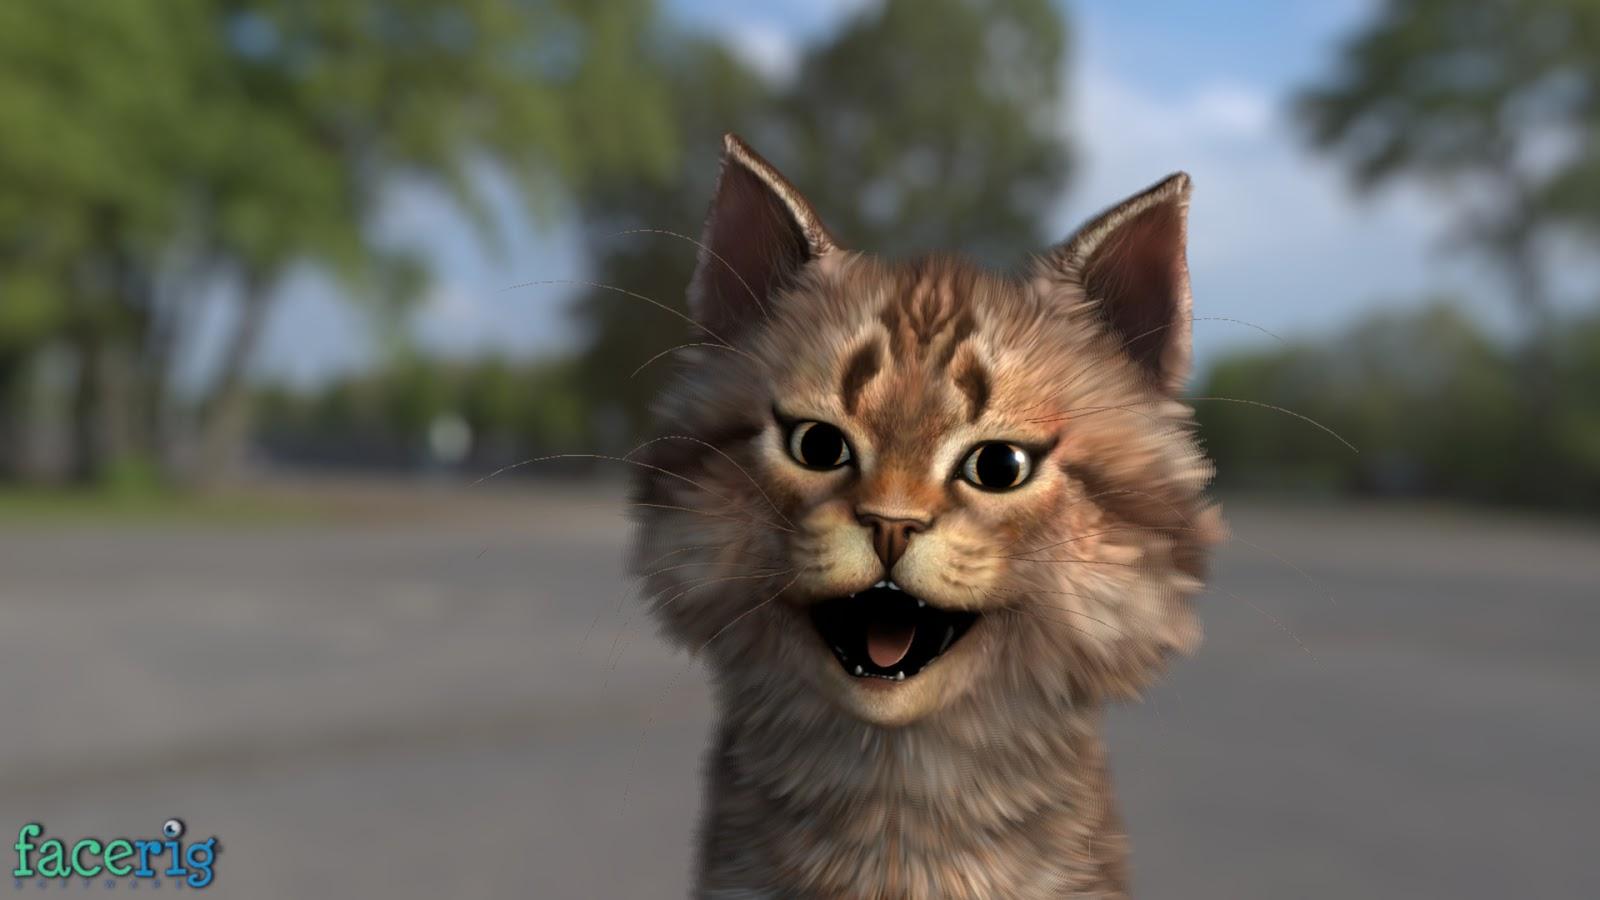 risen saber kitten